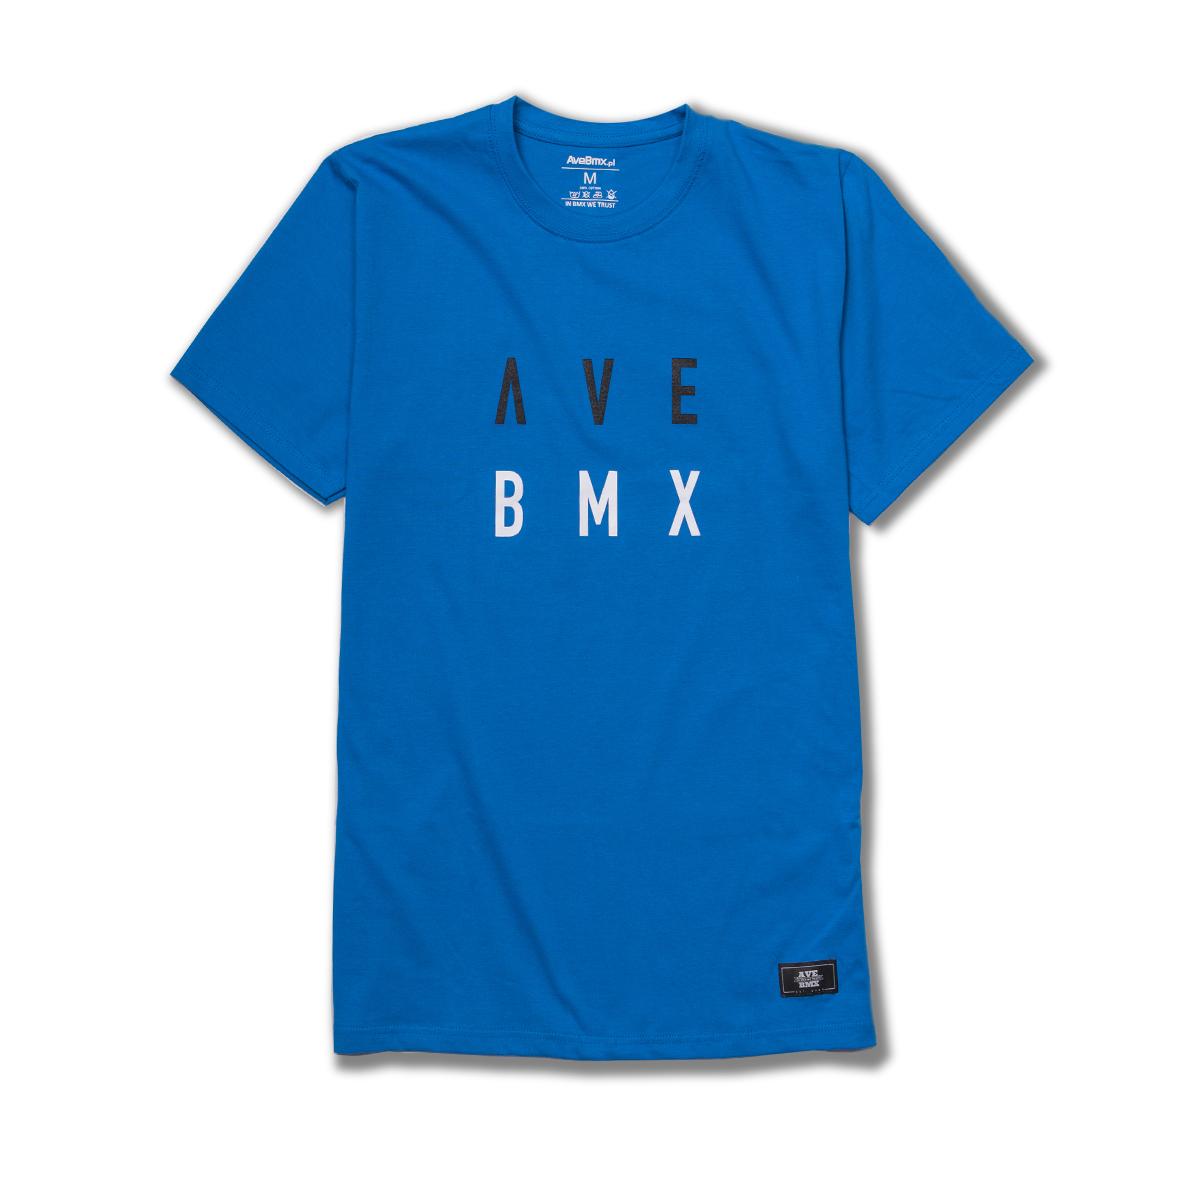 Koszulka Ave Bmx ALIEN Blue